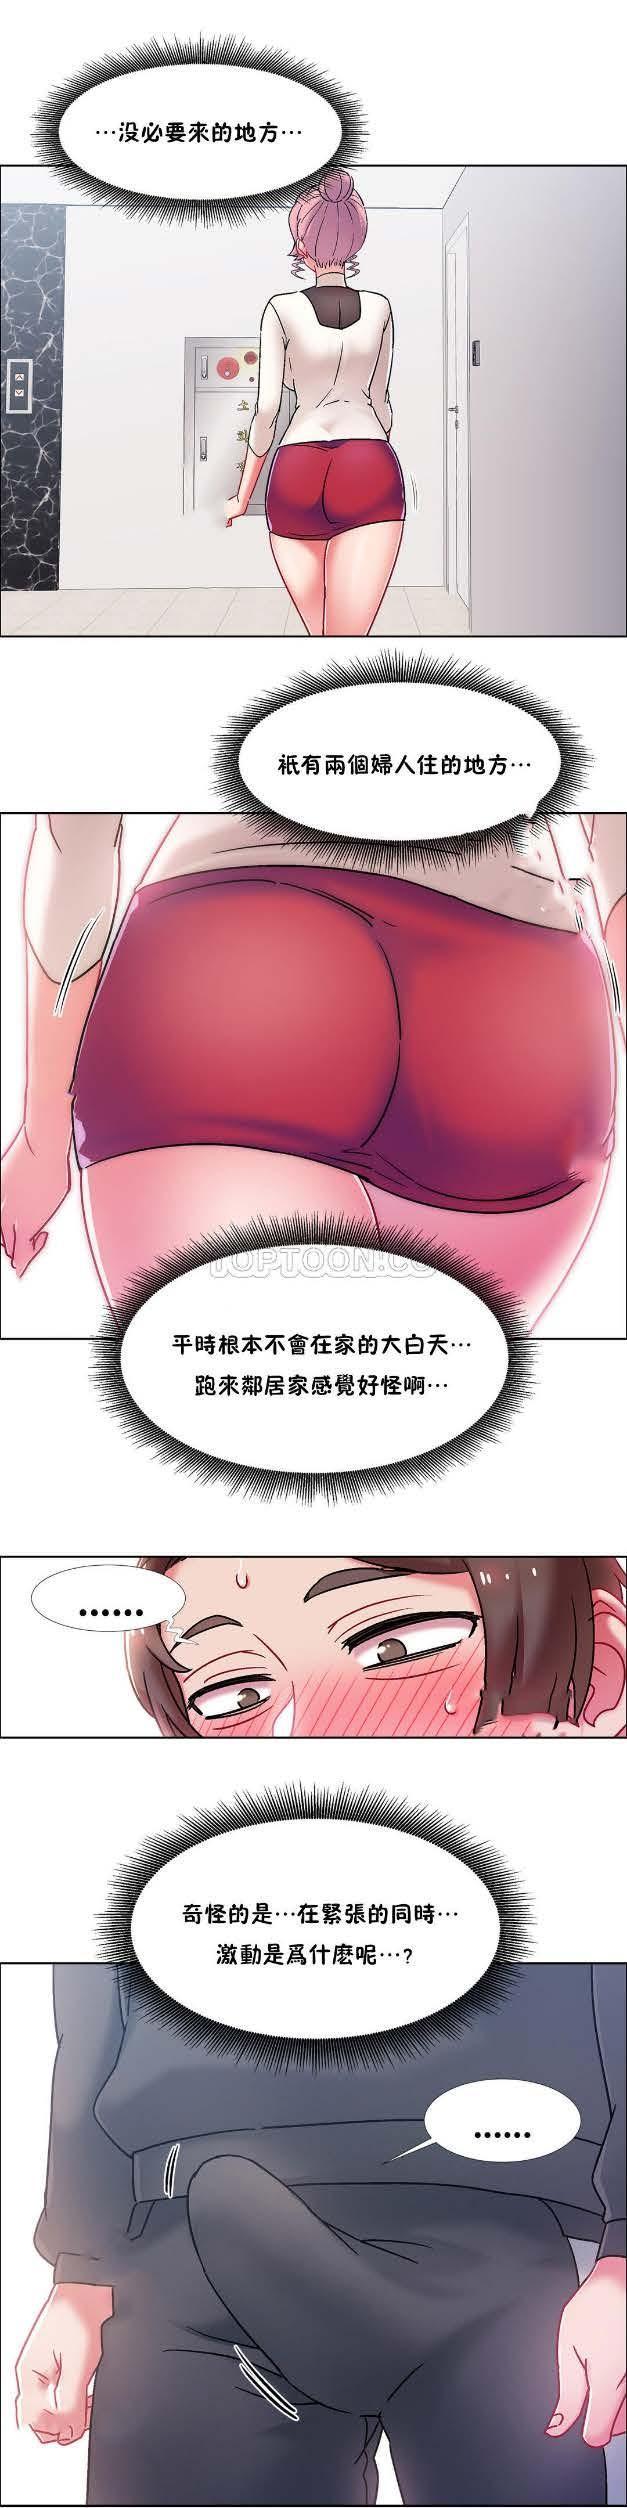 [Studio Wannabe] Rental Girls | 出租女郎 Ch. 33-58 [Chinese]  第二季 完结 294